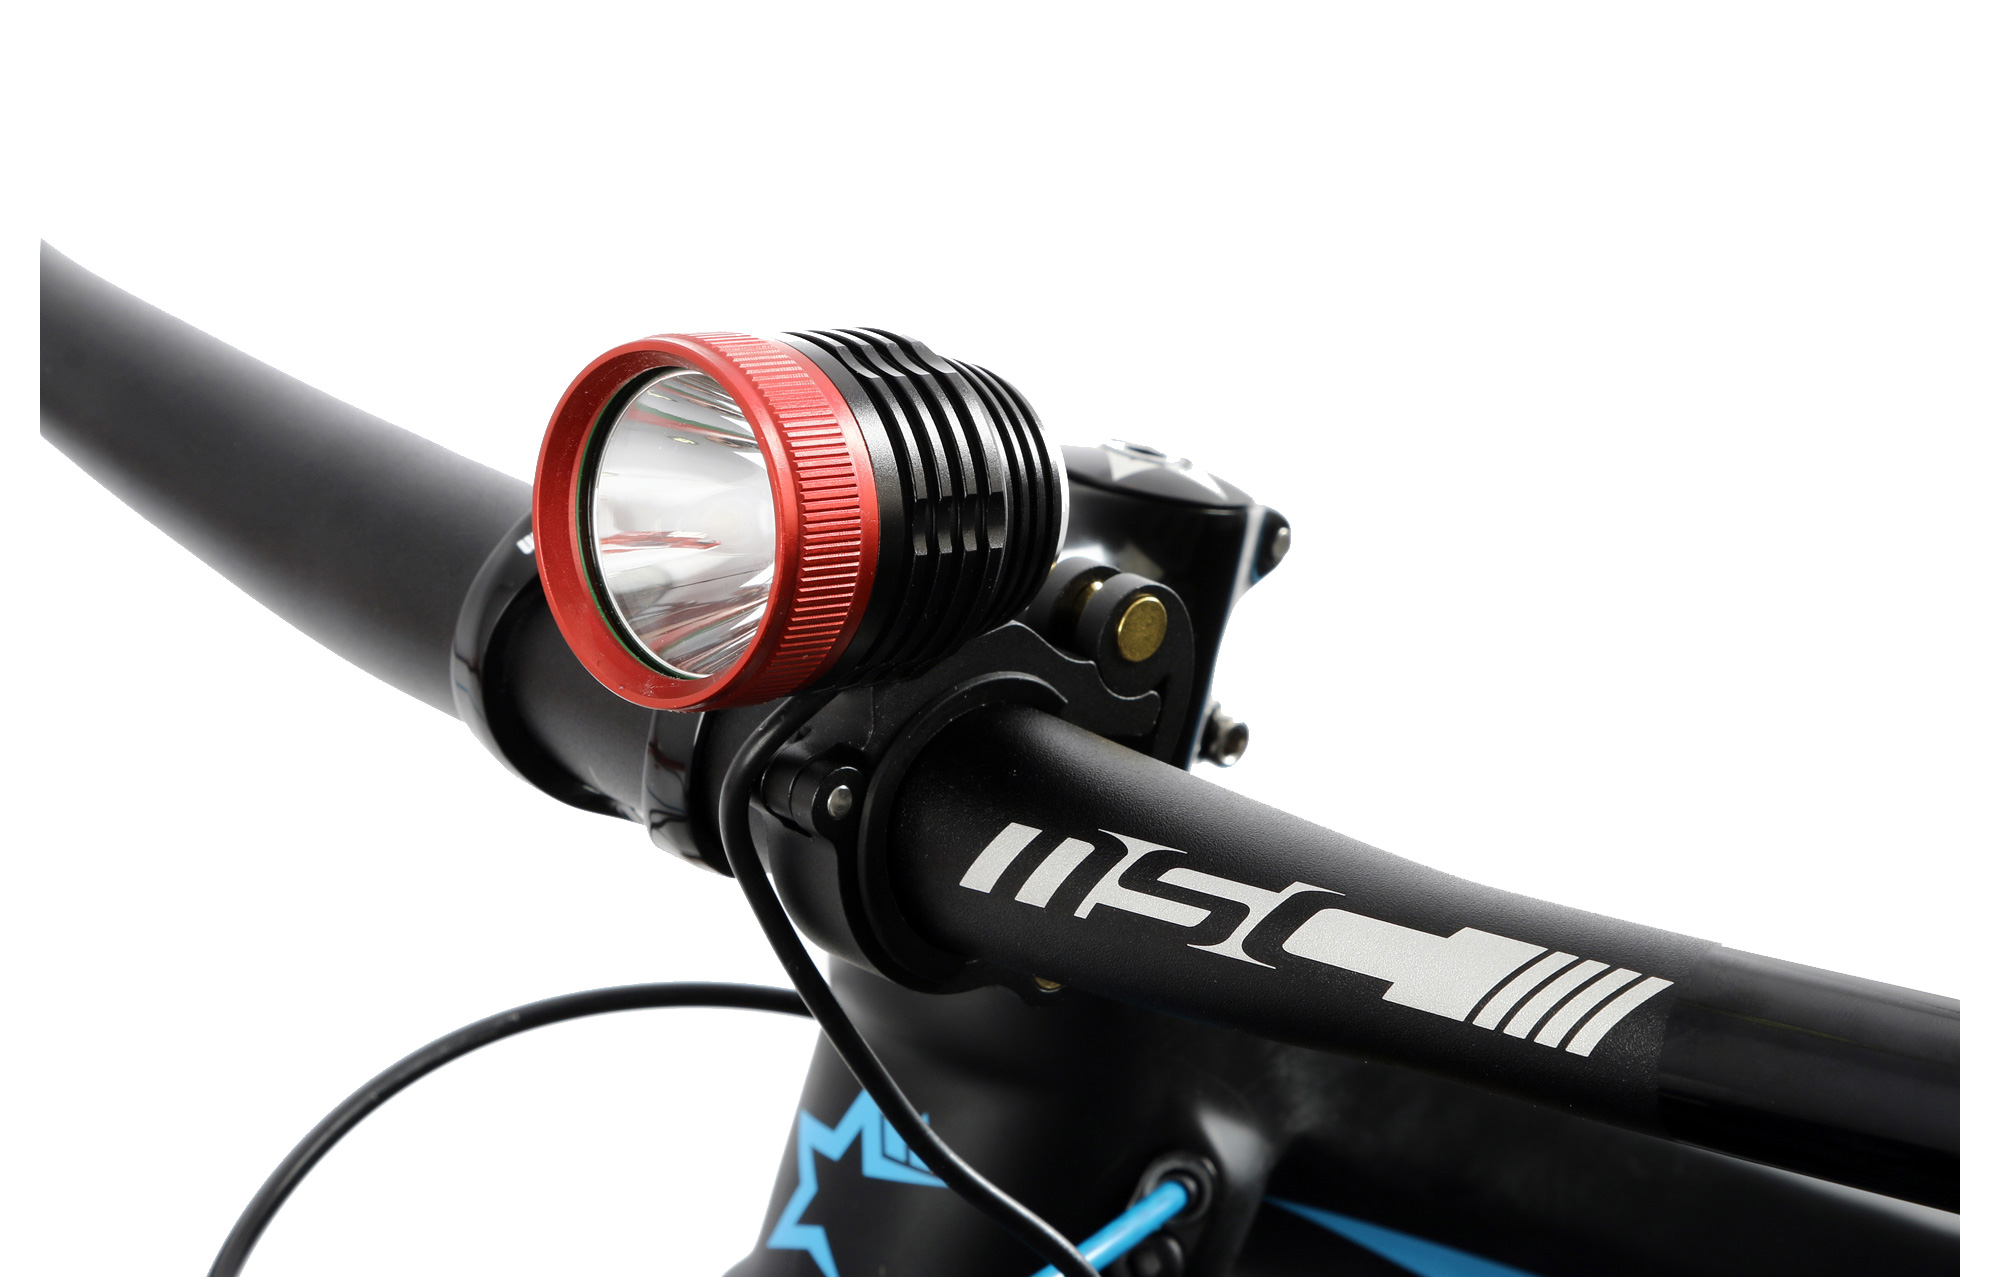 MSC BIKES Bicycle light 1000 Lumens Black